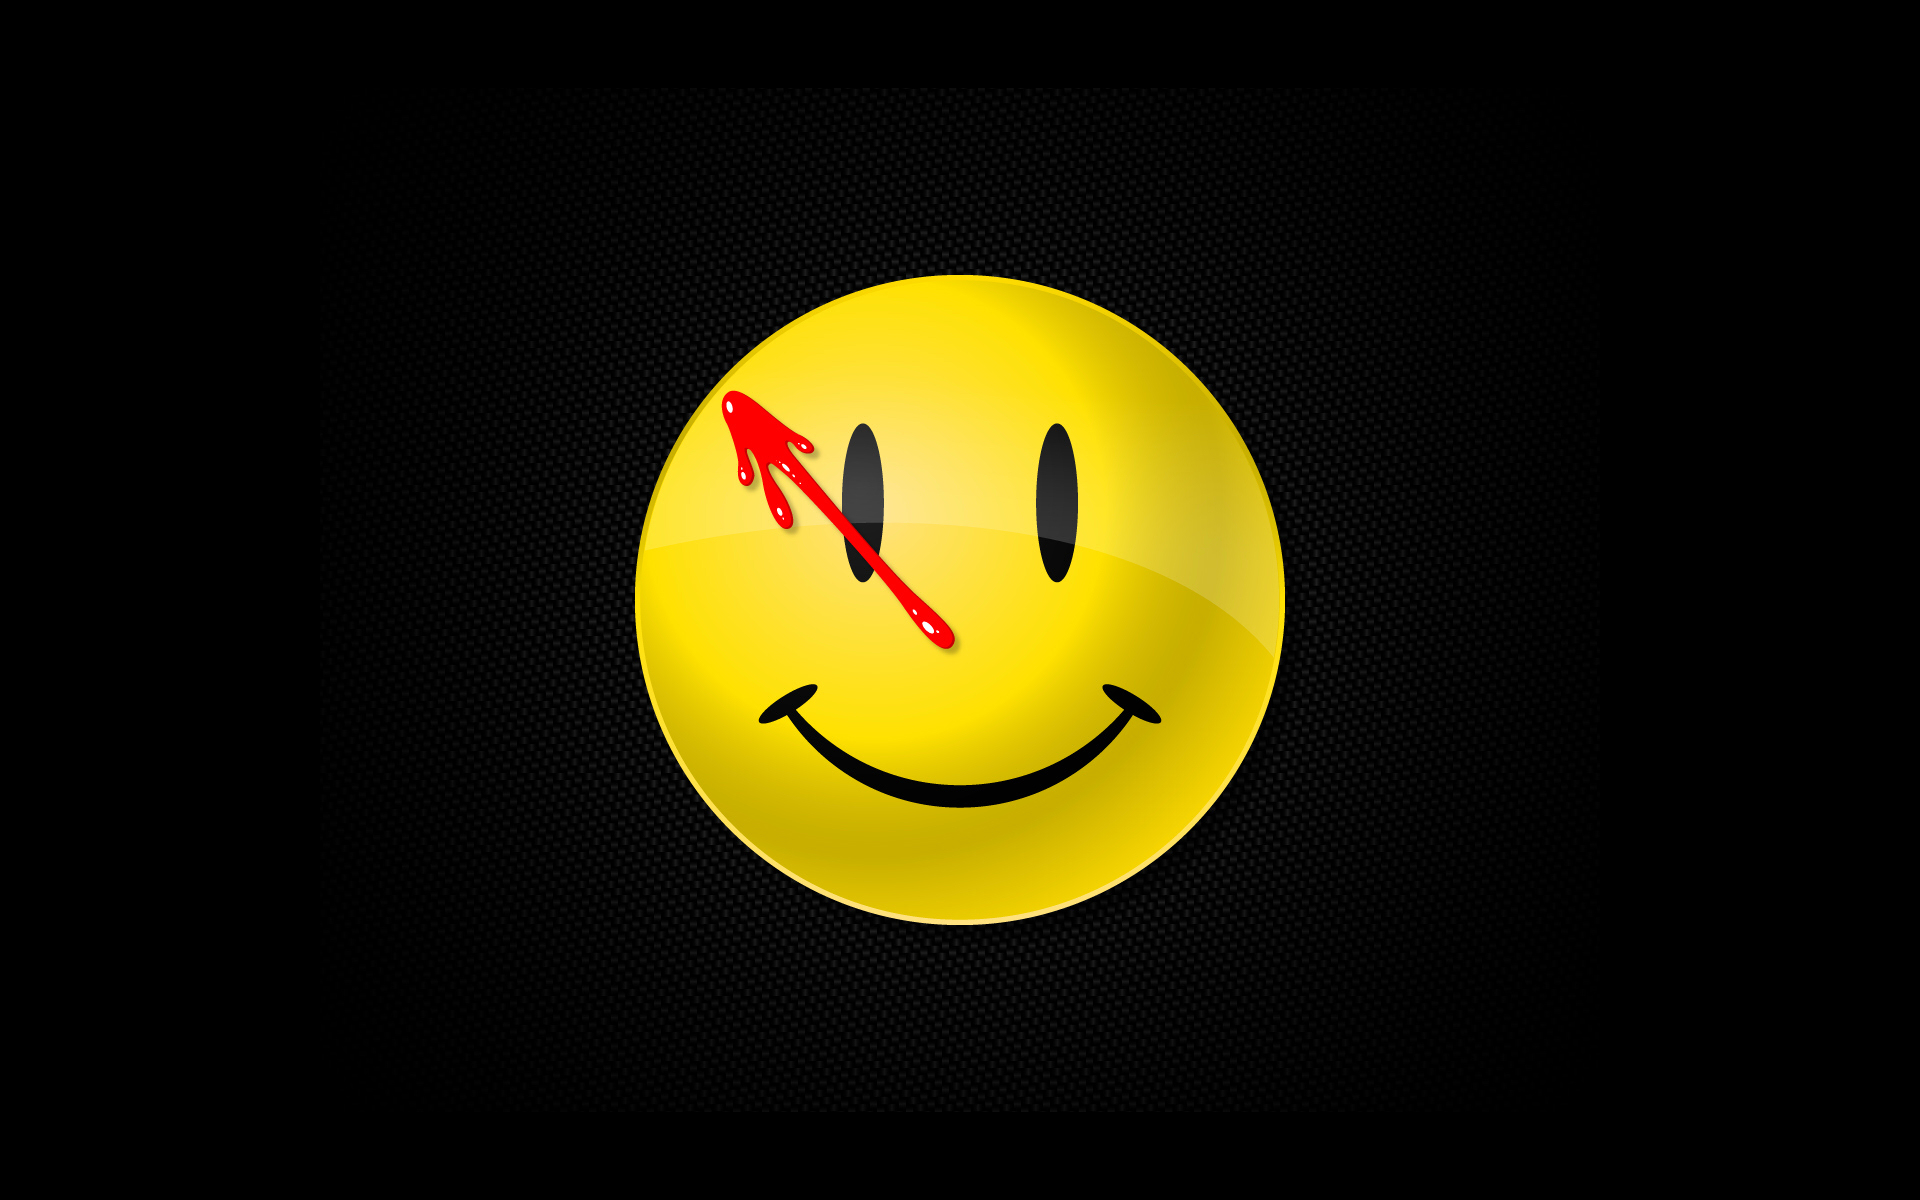 Watchmen Smiley Wallpaper 1920x1200 Watchmen Smiley 1920x1200